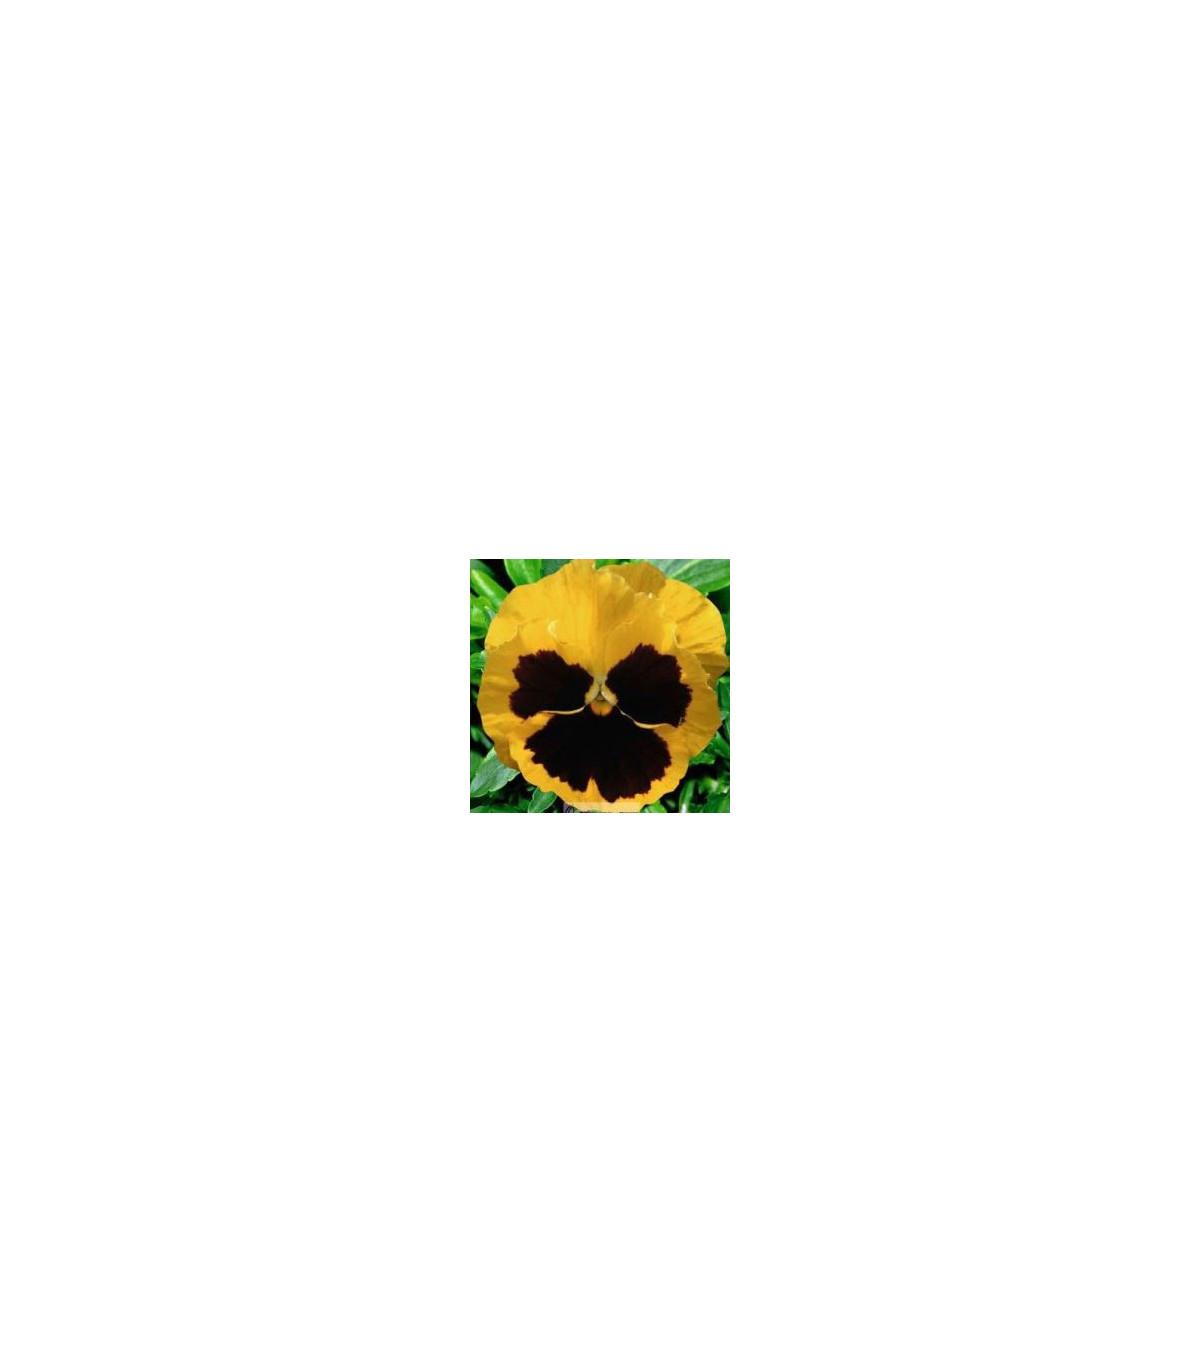 Maceška Schweizer Riesen Goldgelb - Viola wittrockiana - prodej semen - 200 ks